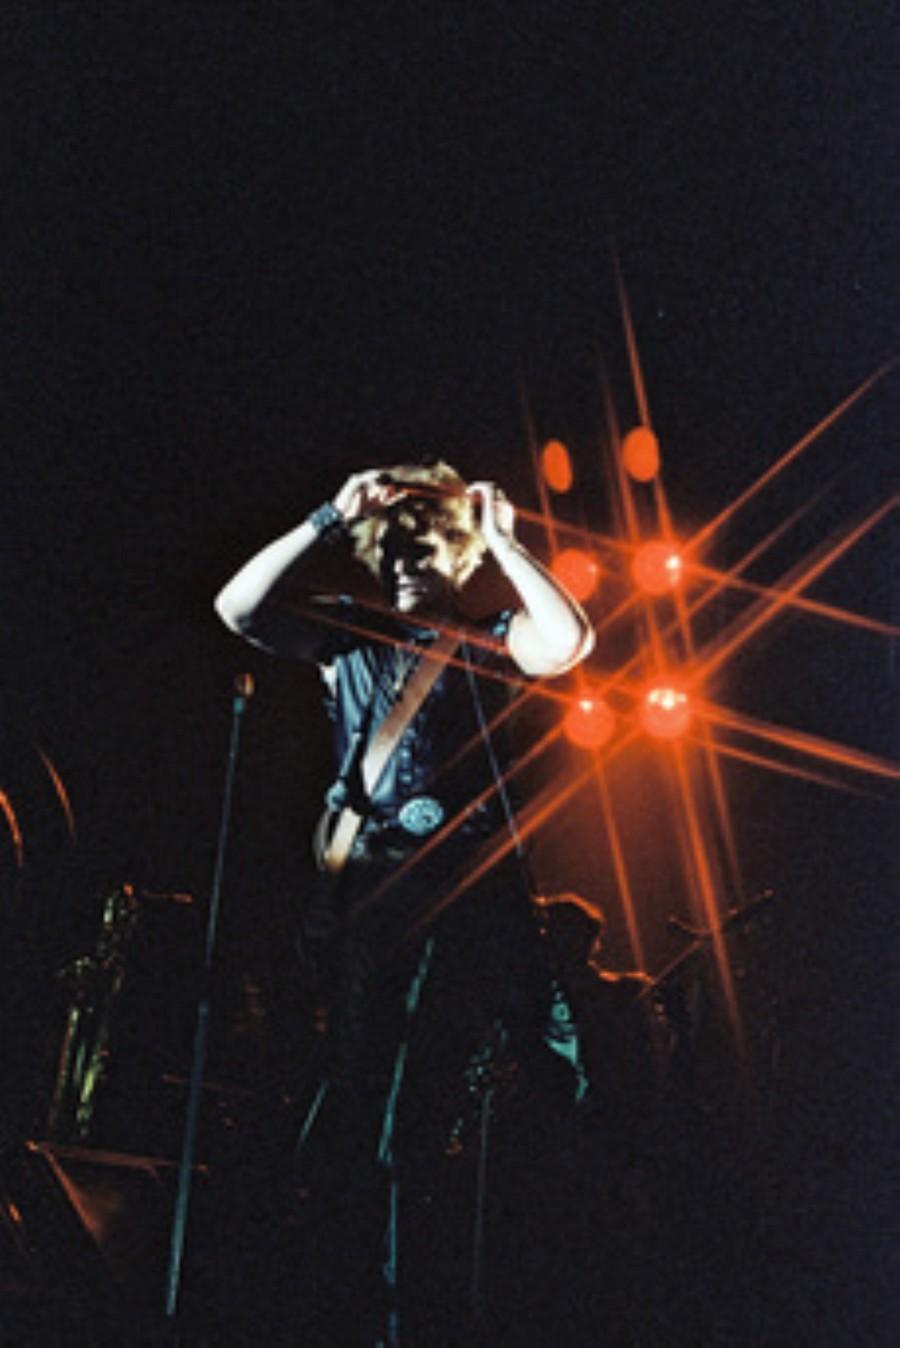 LES CONCERTS DE JOHNNY 'NANCY 1983' Akg77190